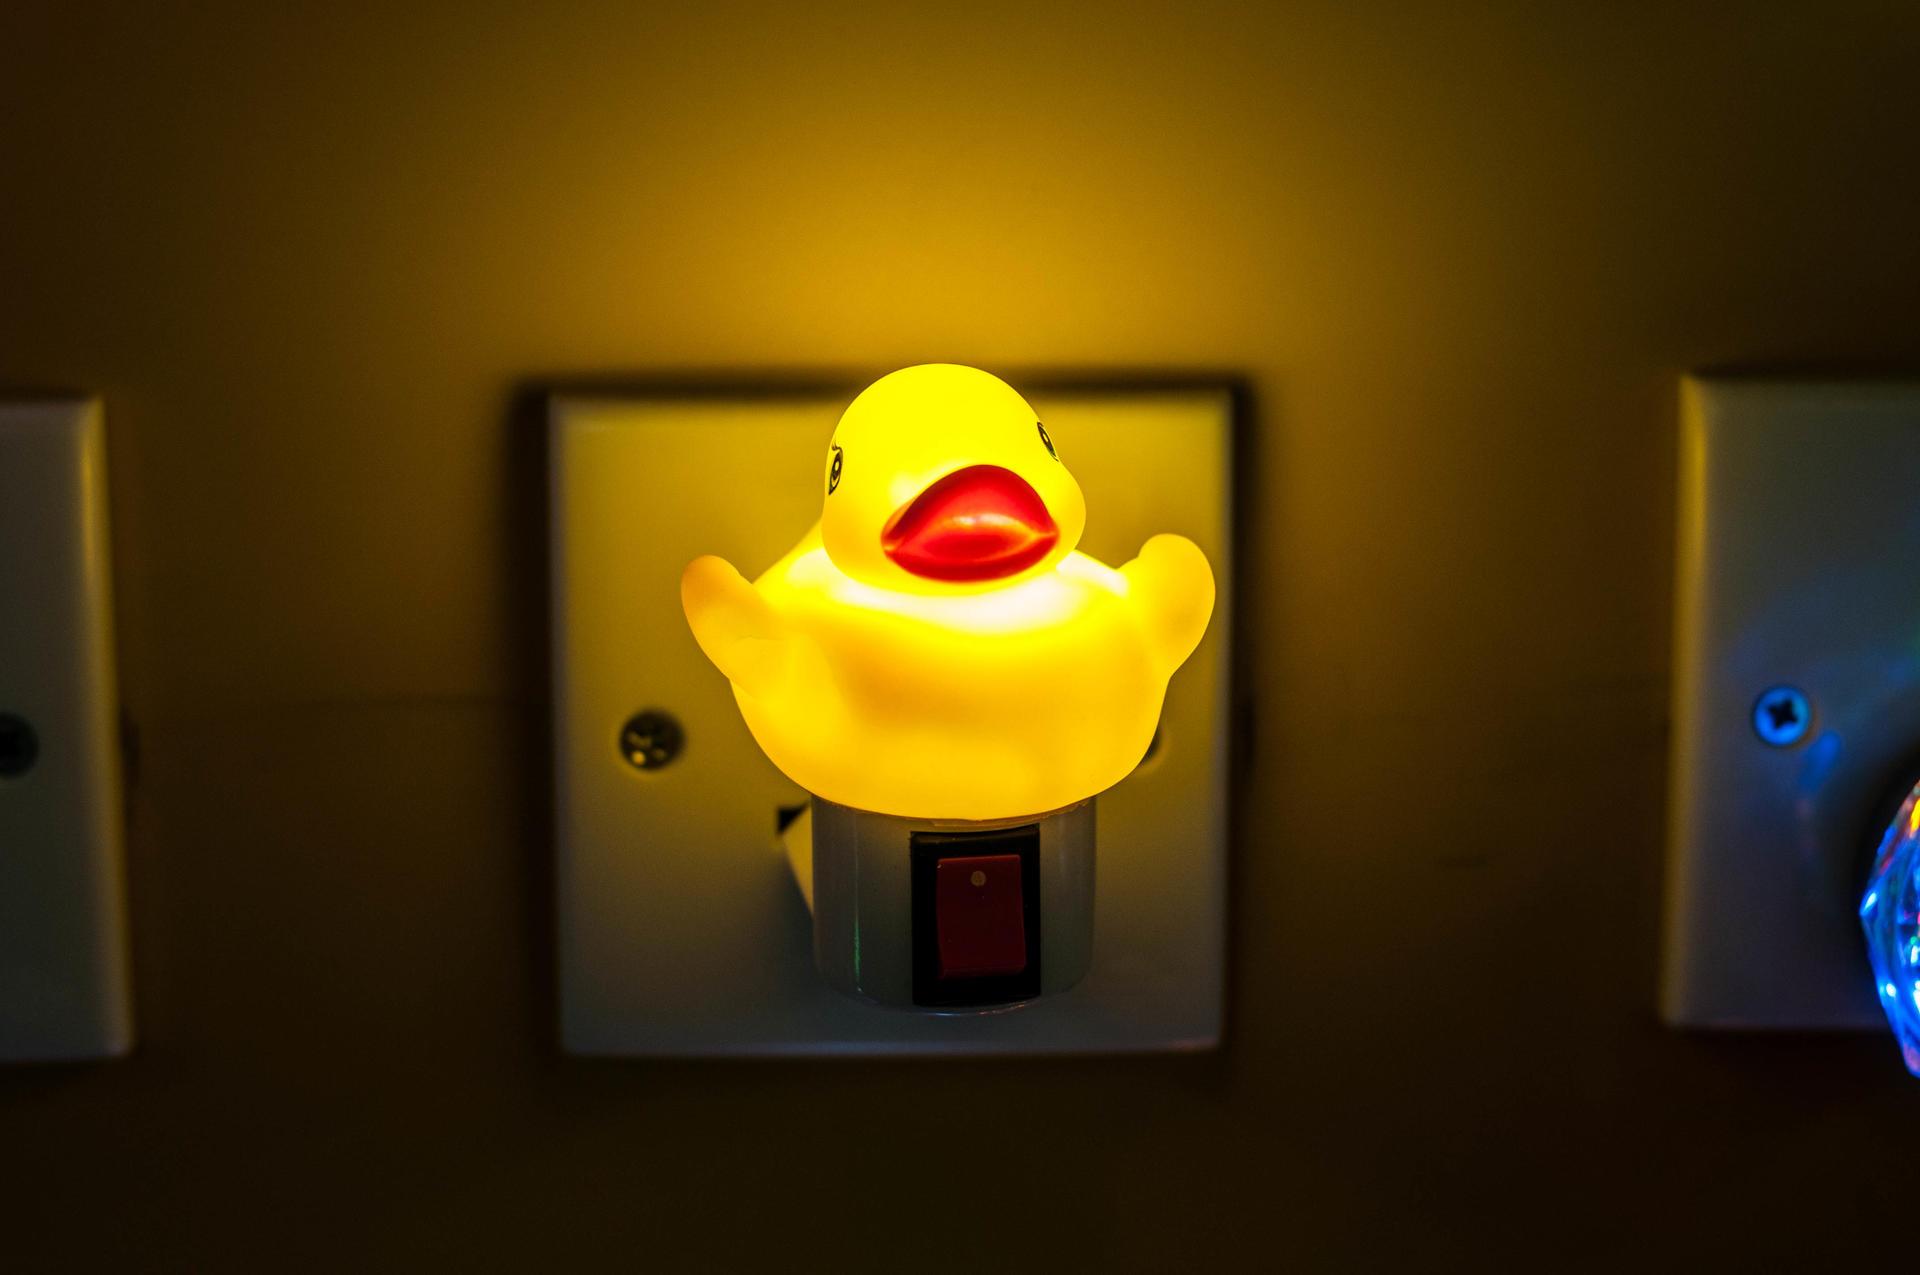 OEM Baby Bedroom Carton Animal Cute Silicone Sleep LED Night Light 7 Colors Changing LED Sensor Light